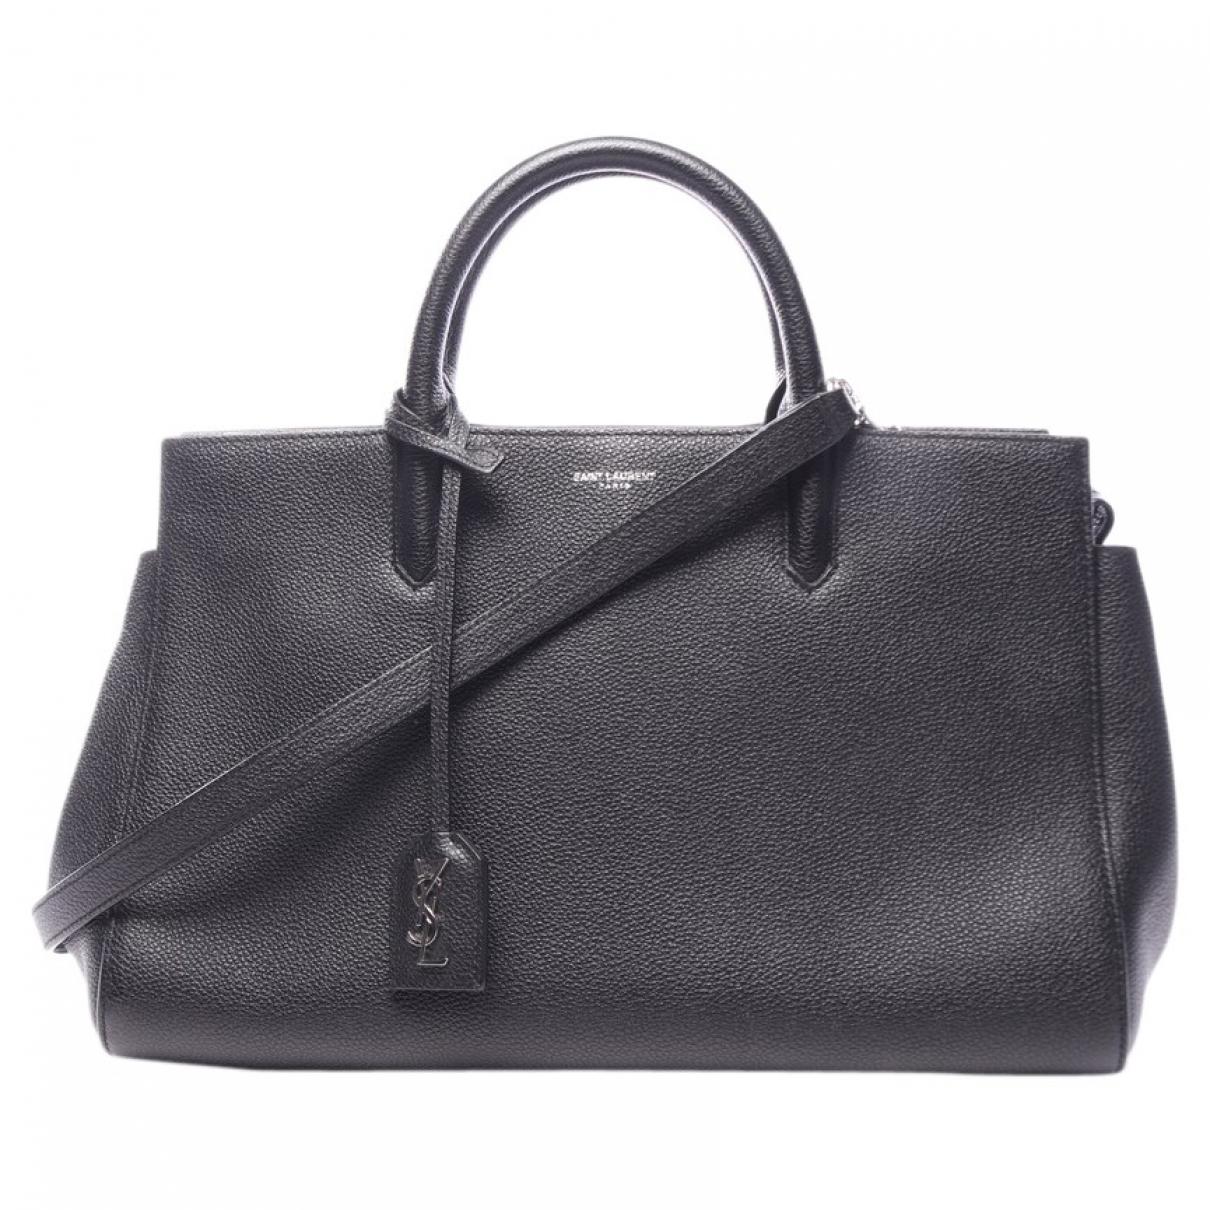 Saint Laurent Cabas Rive Gauche Handtasche in  Schwarz Leder